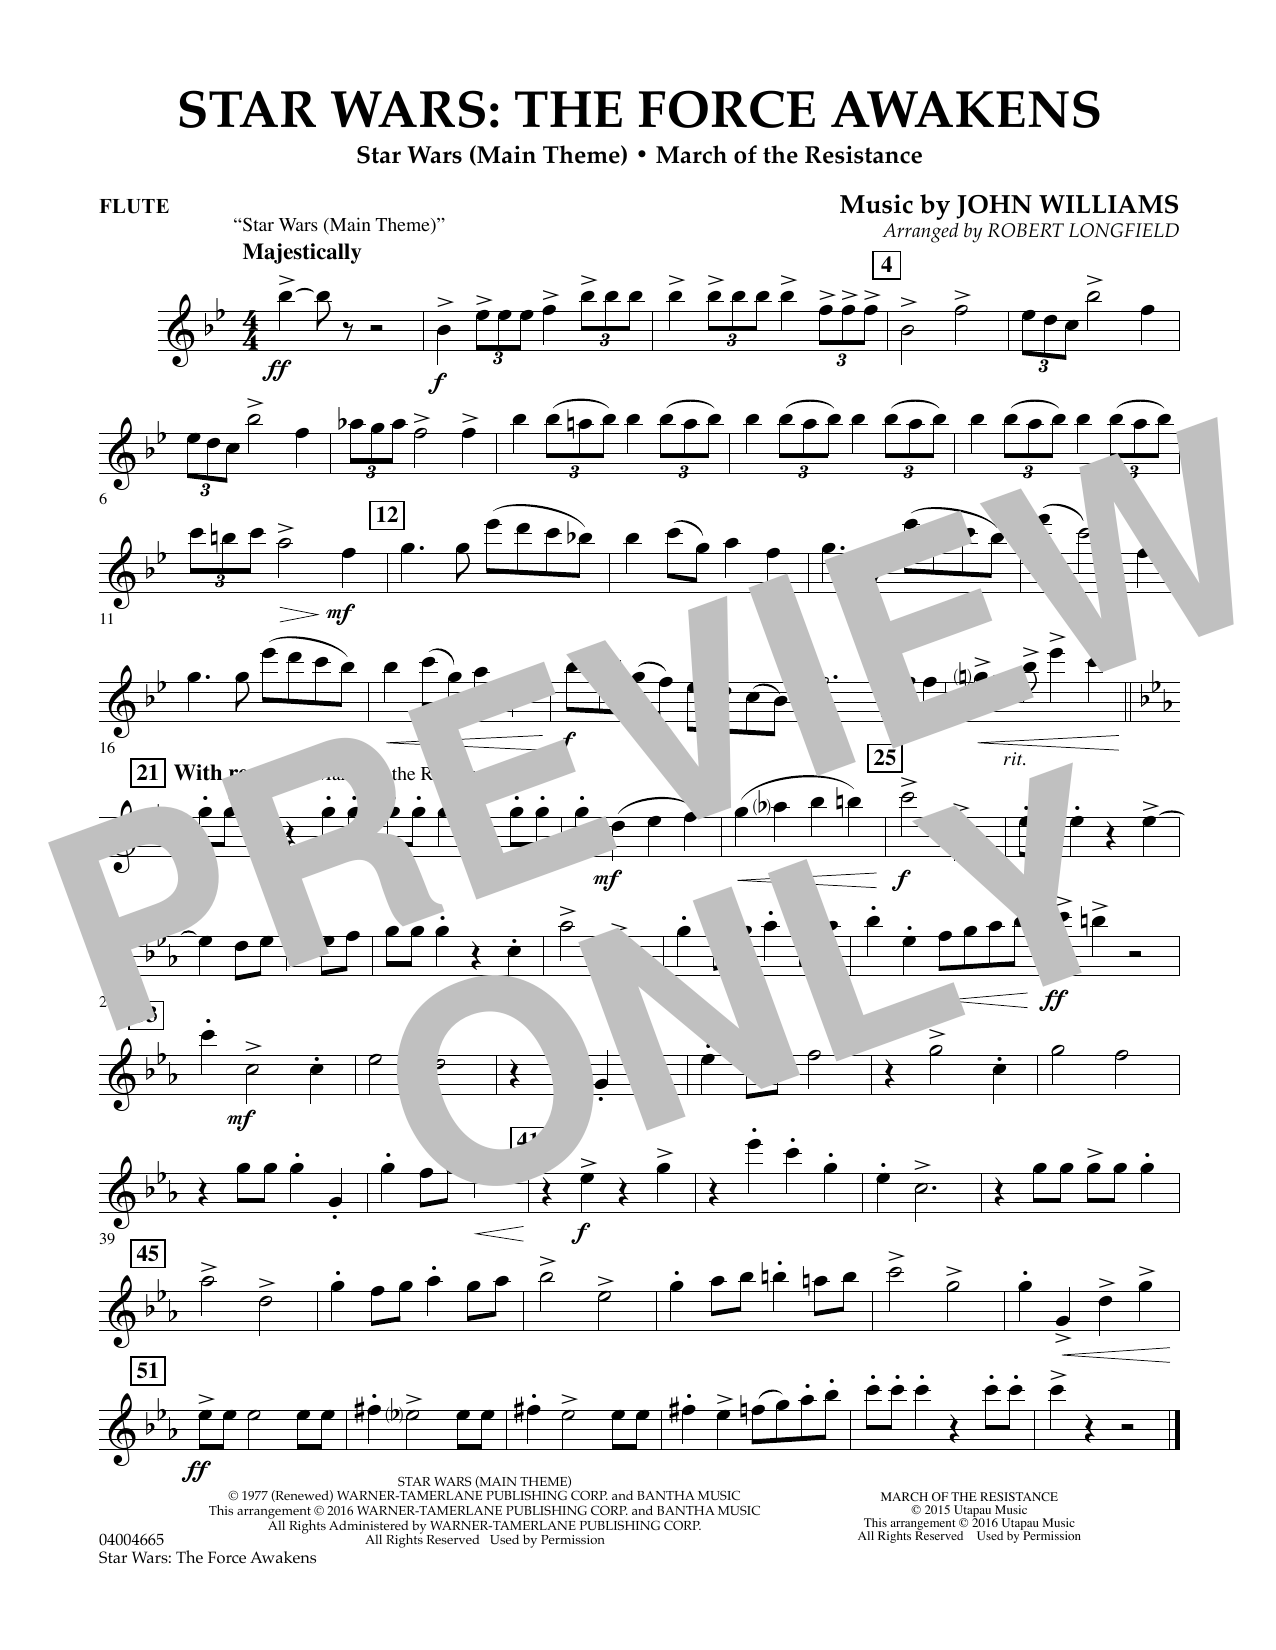 Star Wars: The Force Awakens - Flute (Concert Band)